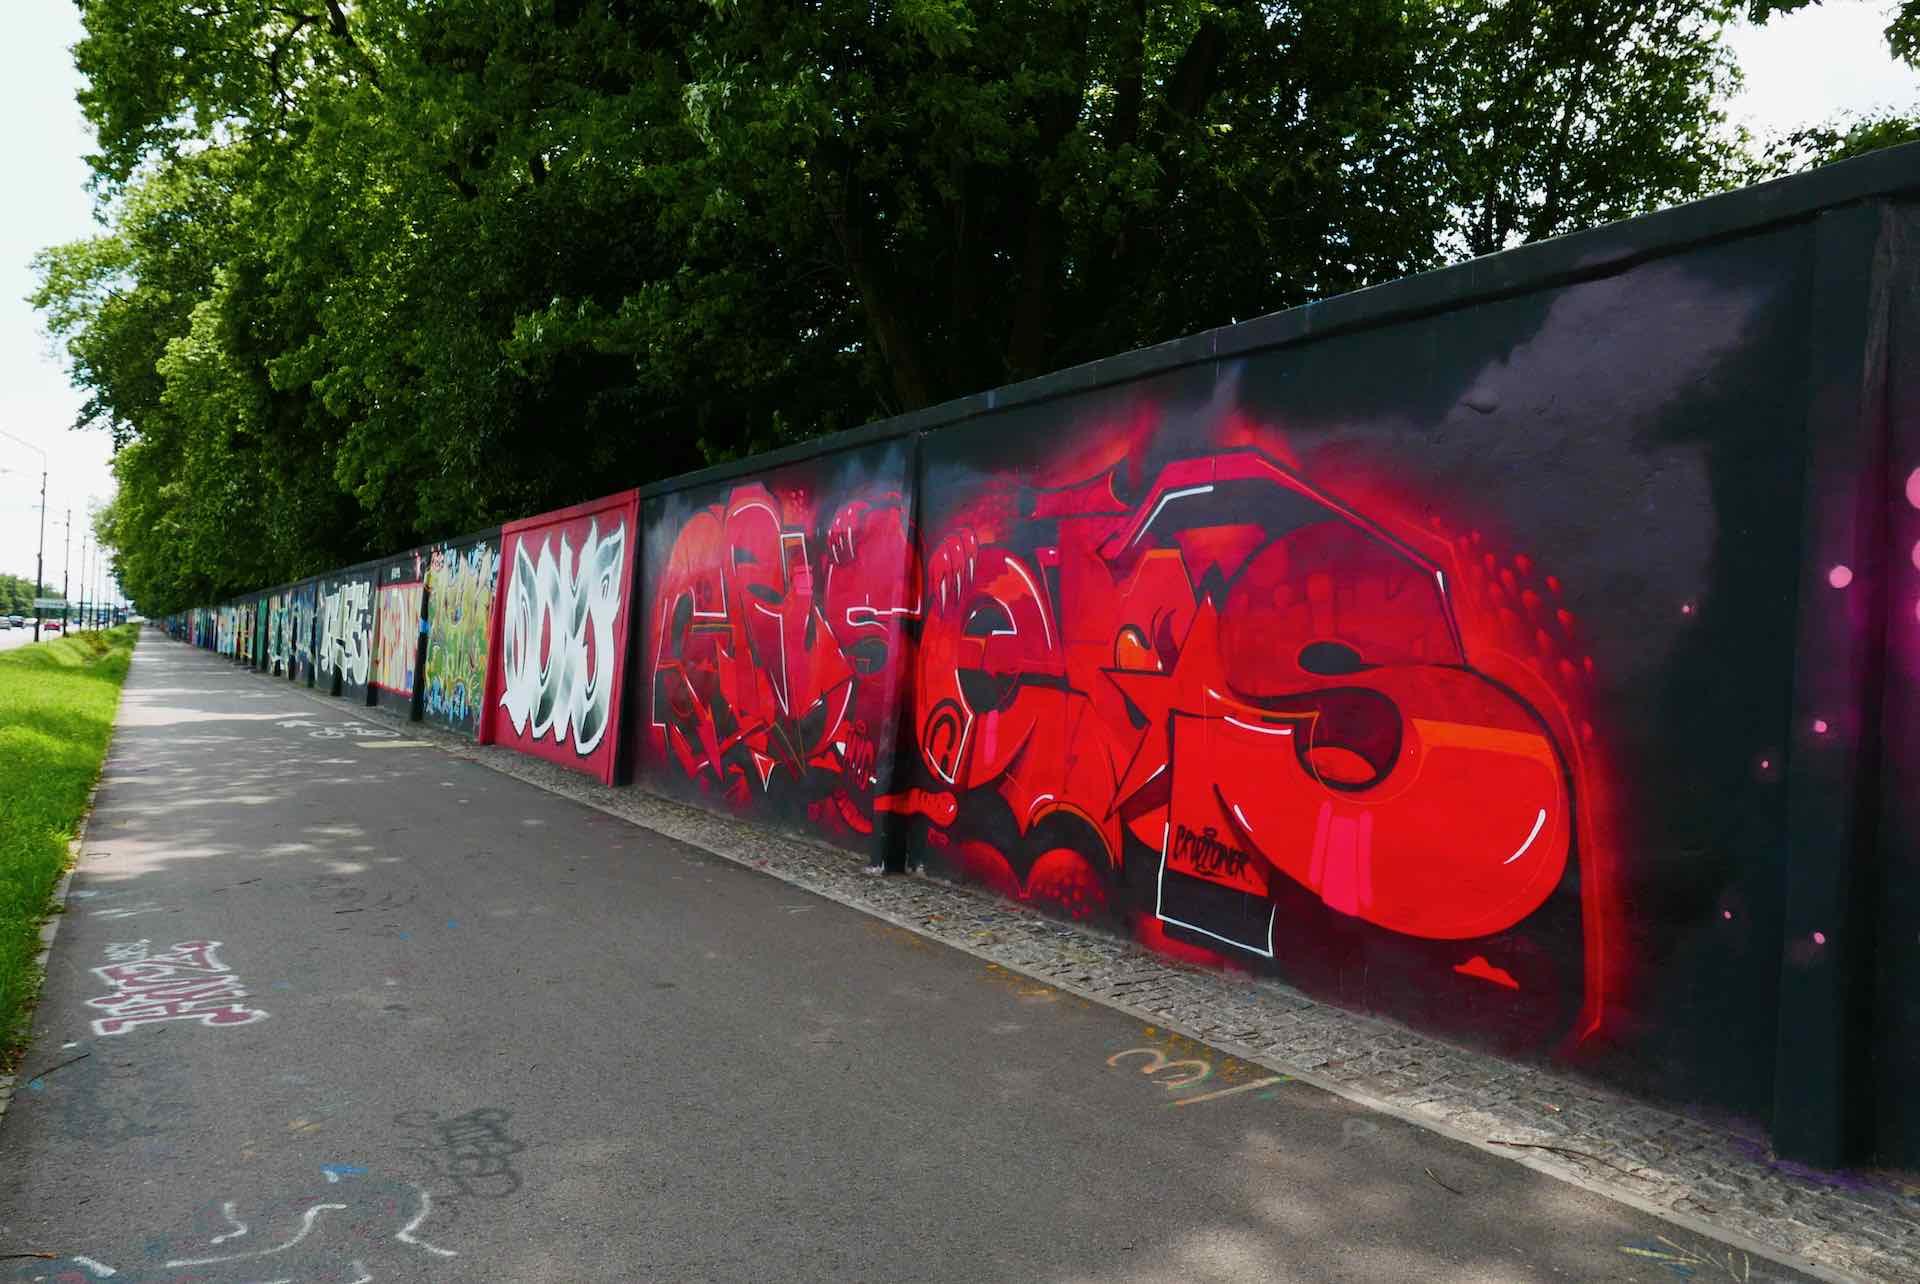 Street art Warsaw